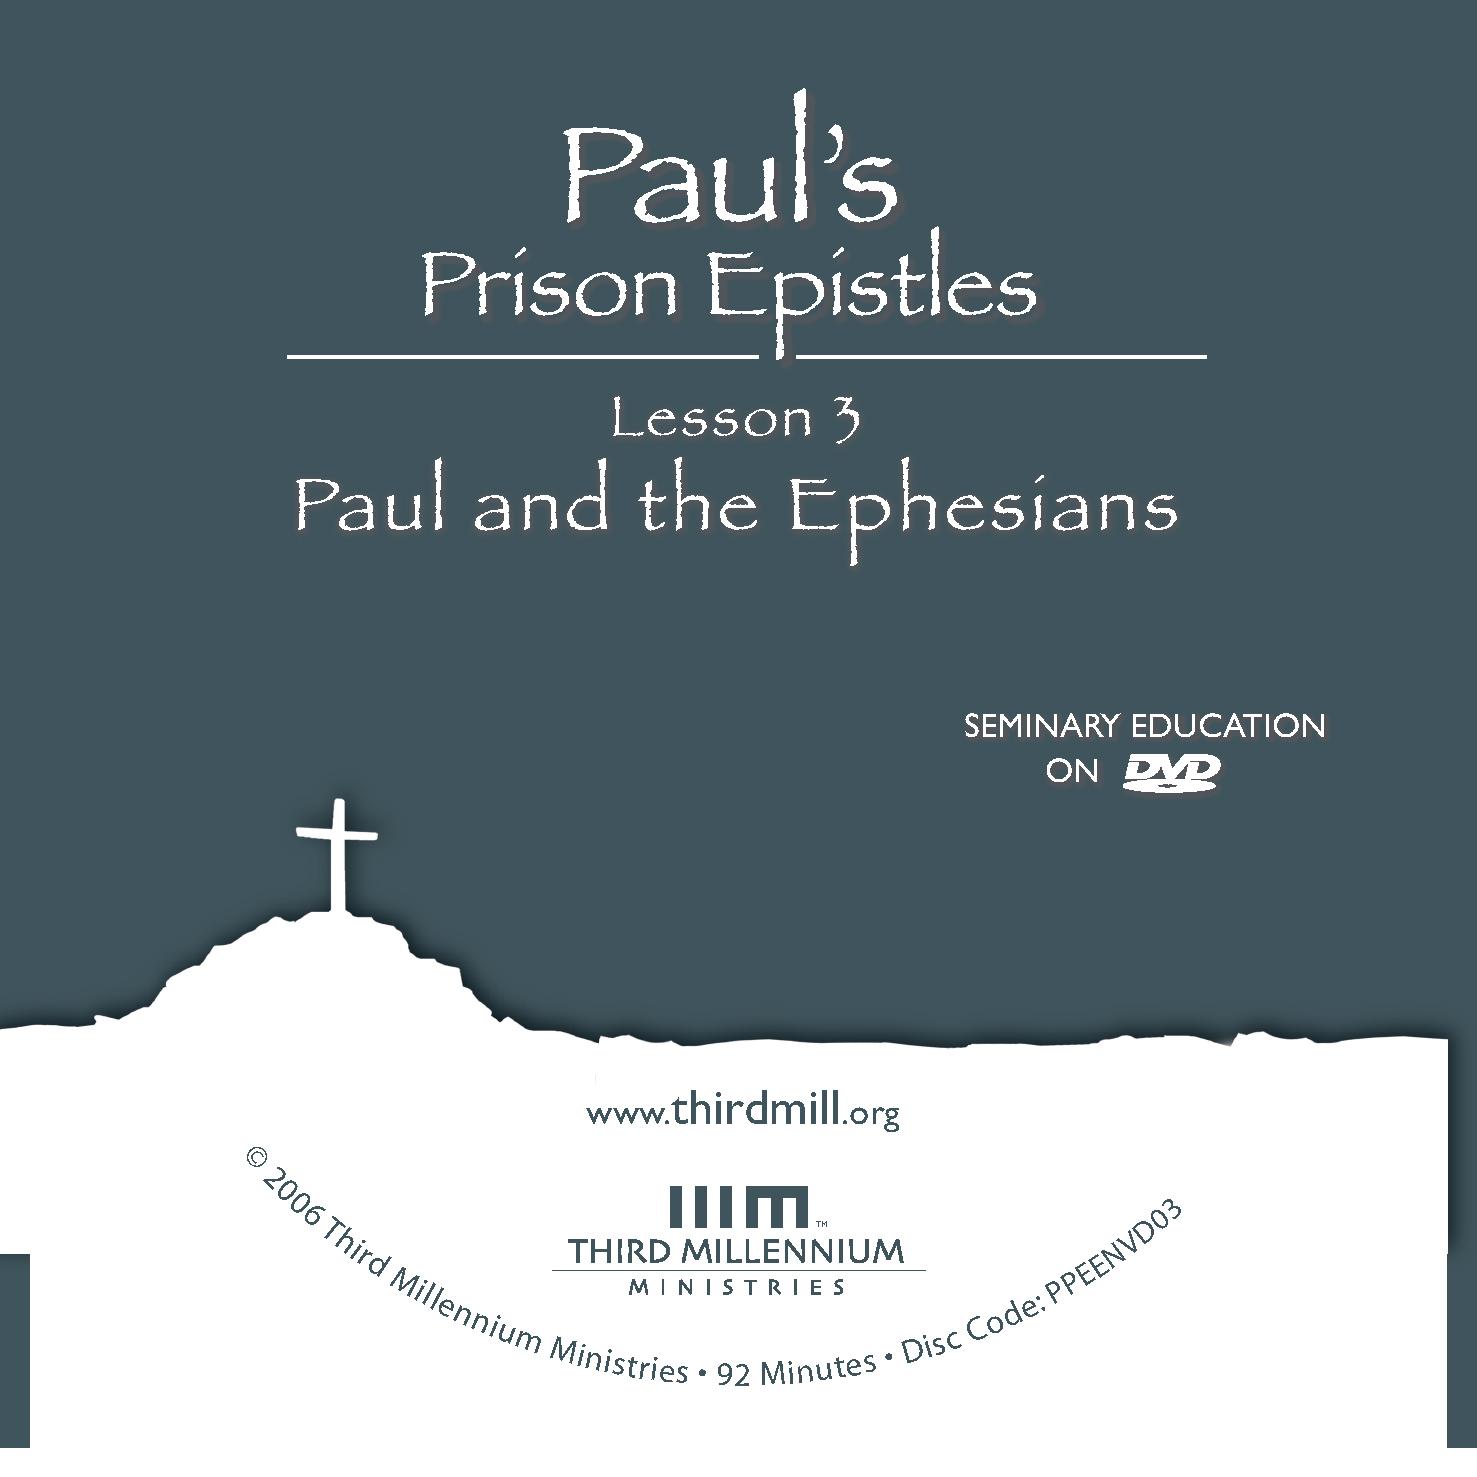 Paul's Prison Epistles: Paul and the Ephesians (high